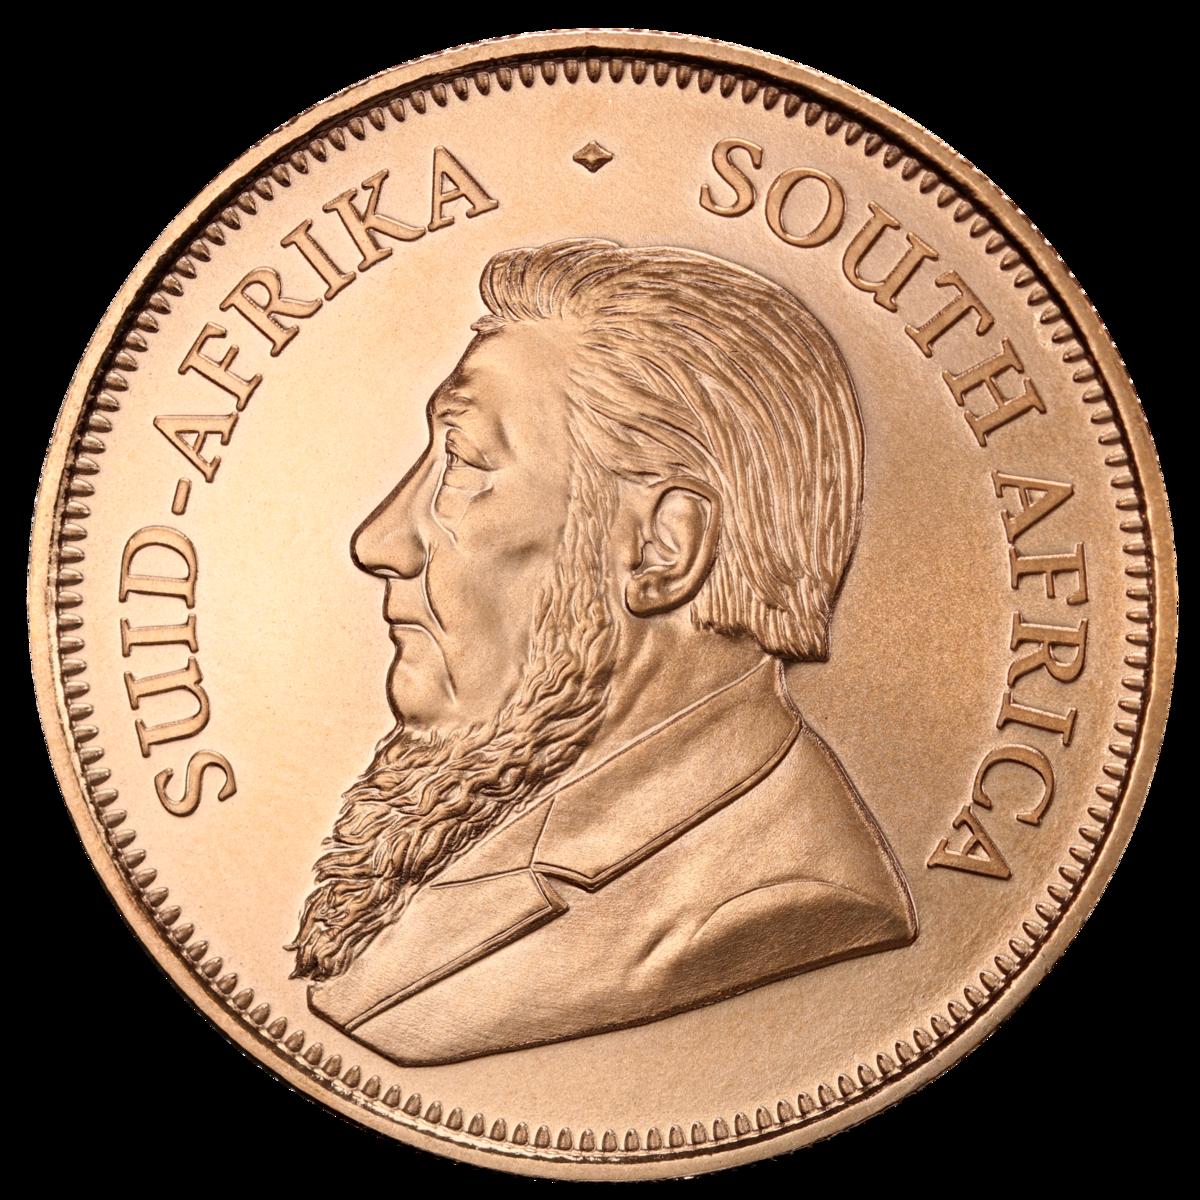 Krugerrand Wikipedia